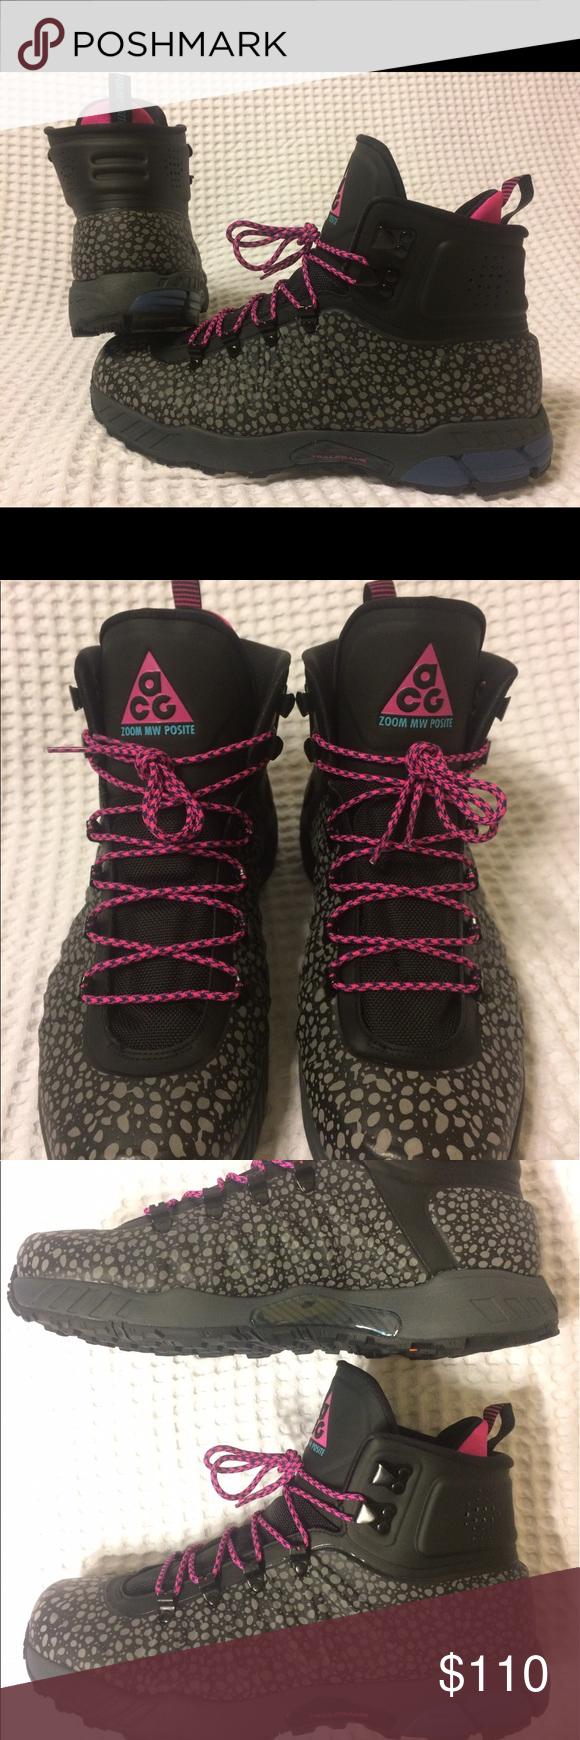 the latest e29bf e37fc Nike ACG Zoom MW Posite  Safari  Boots BRAND NEW, NEVER WORN Nike ACG